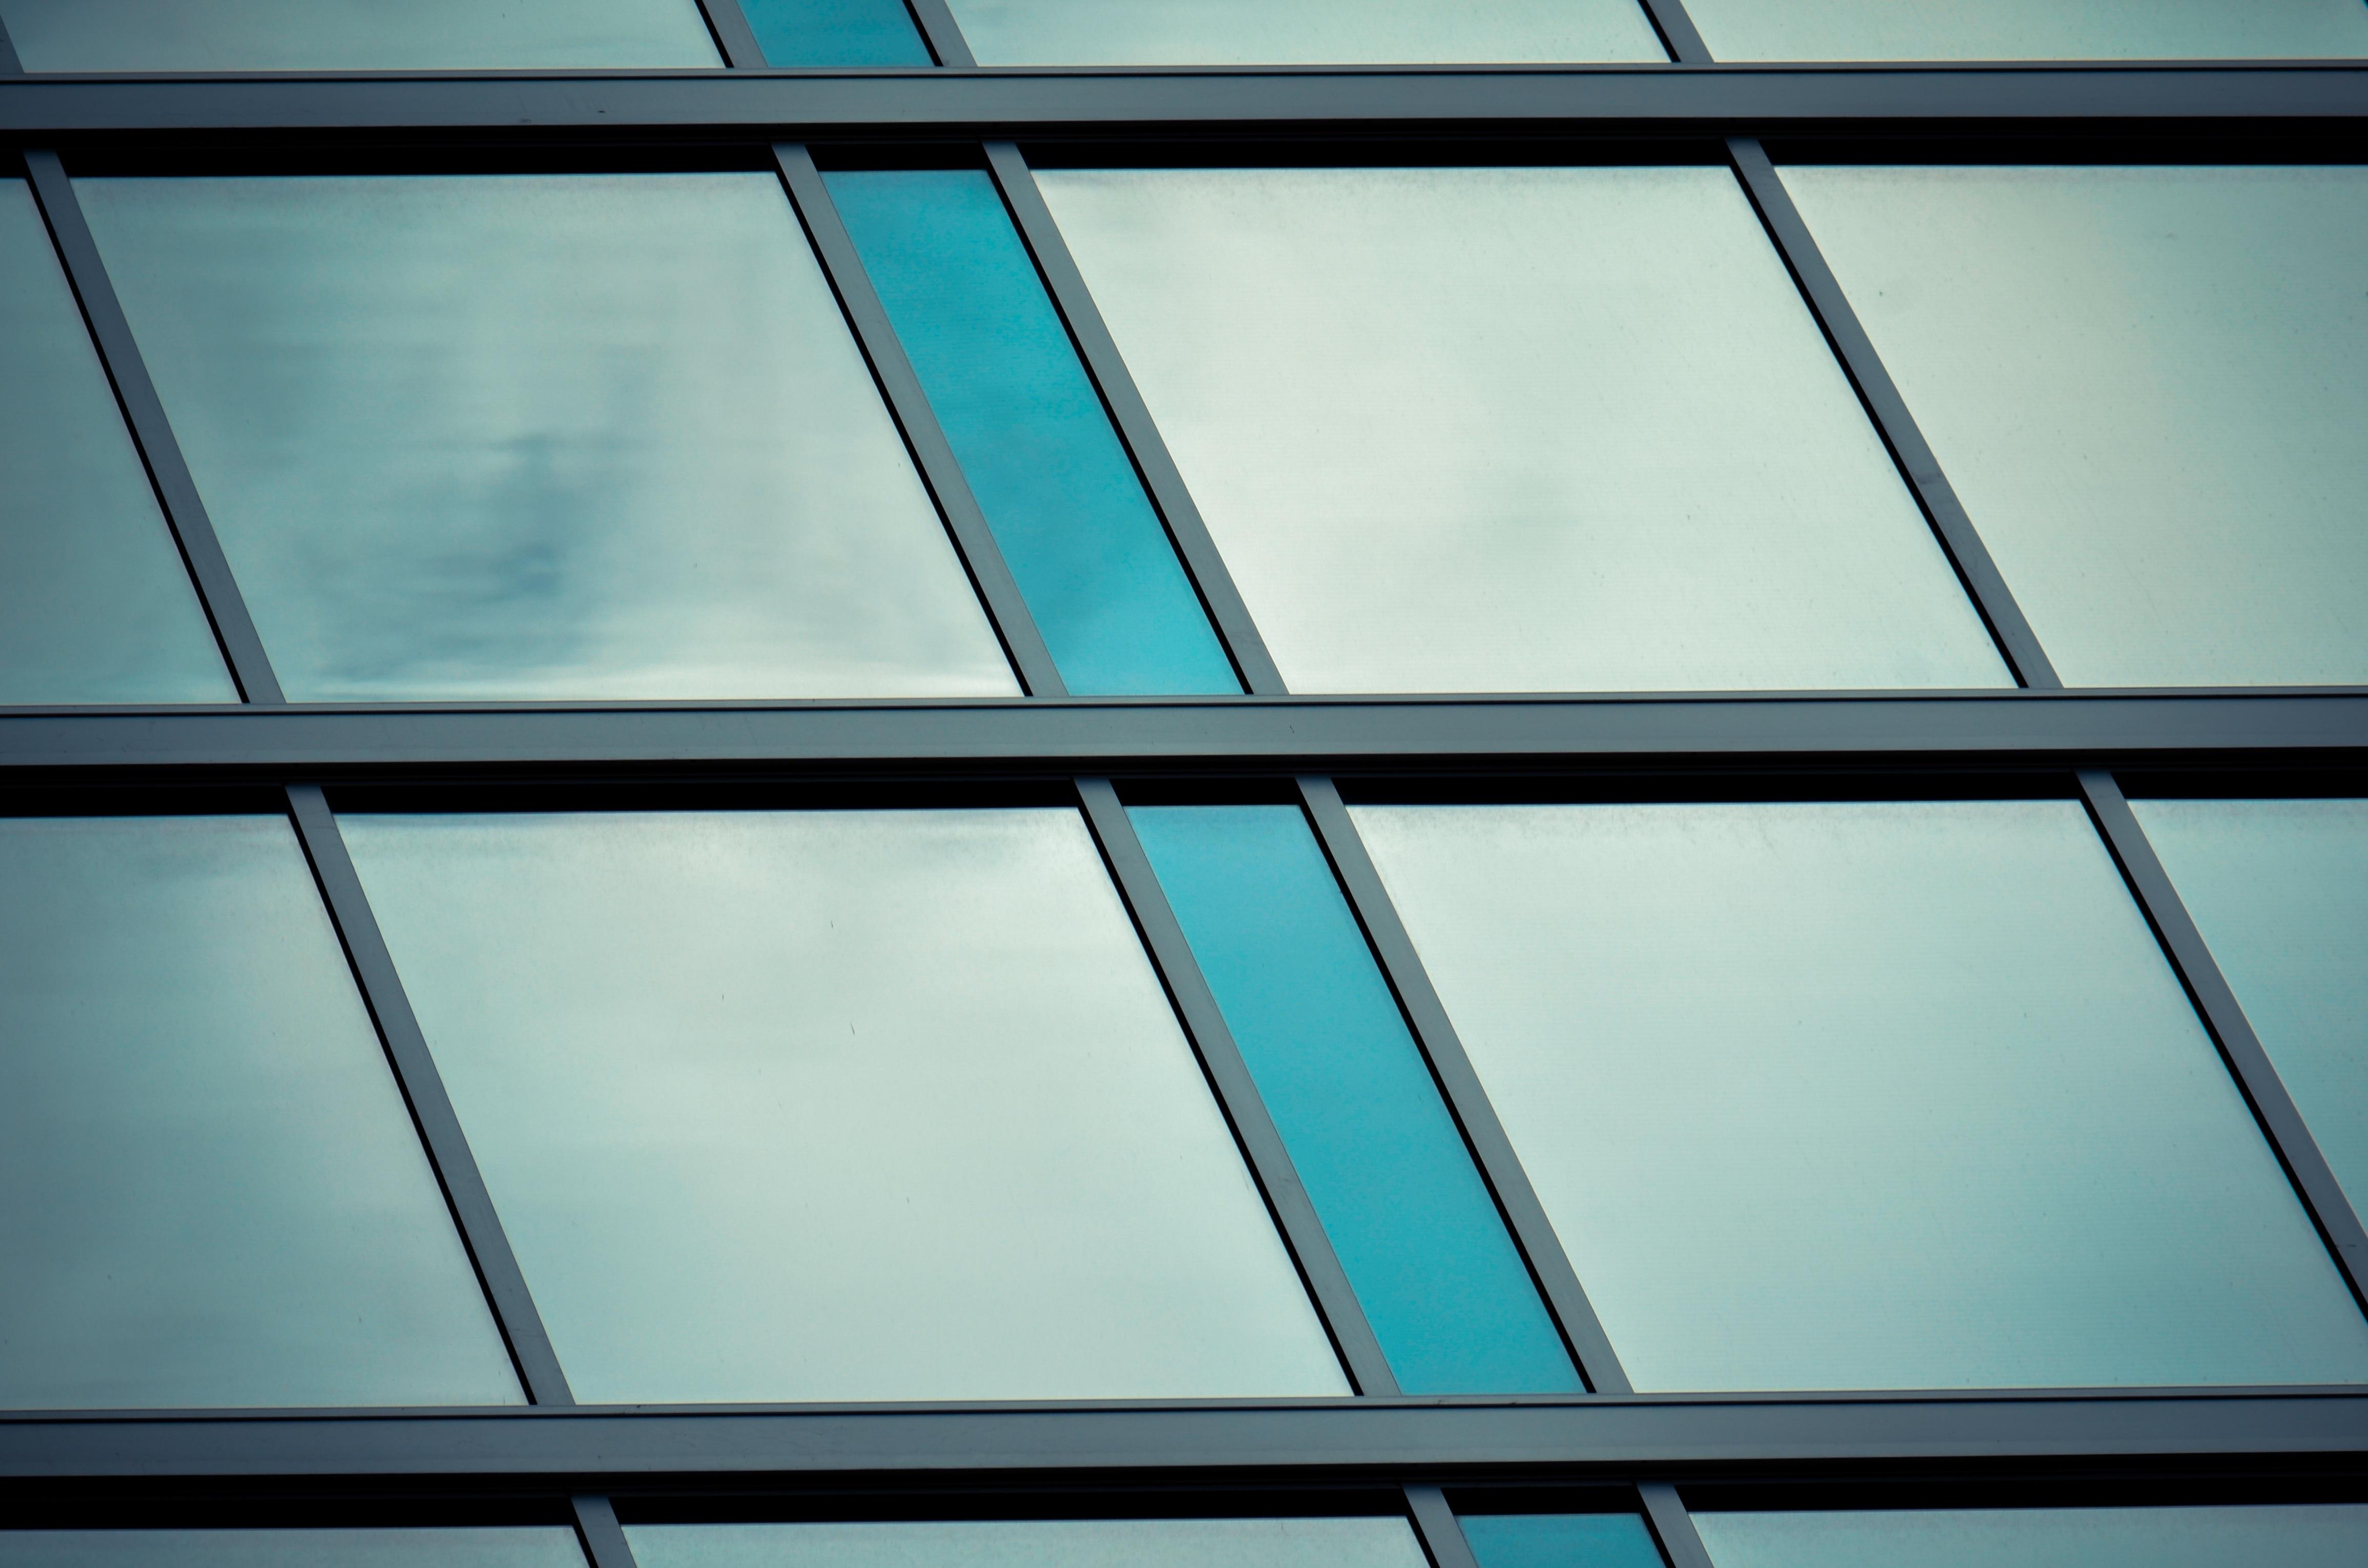 Fotos gratis : pantalla, arquitectura, tecnología, piso, vaso ...